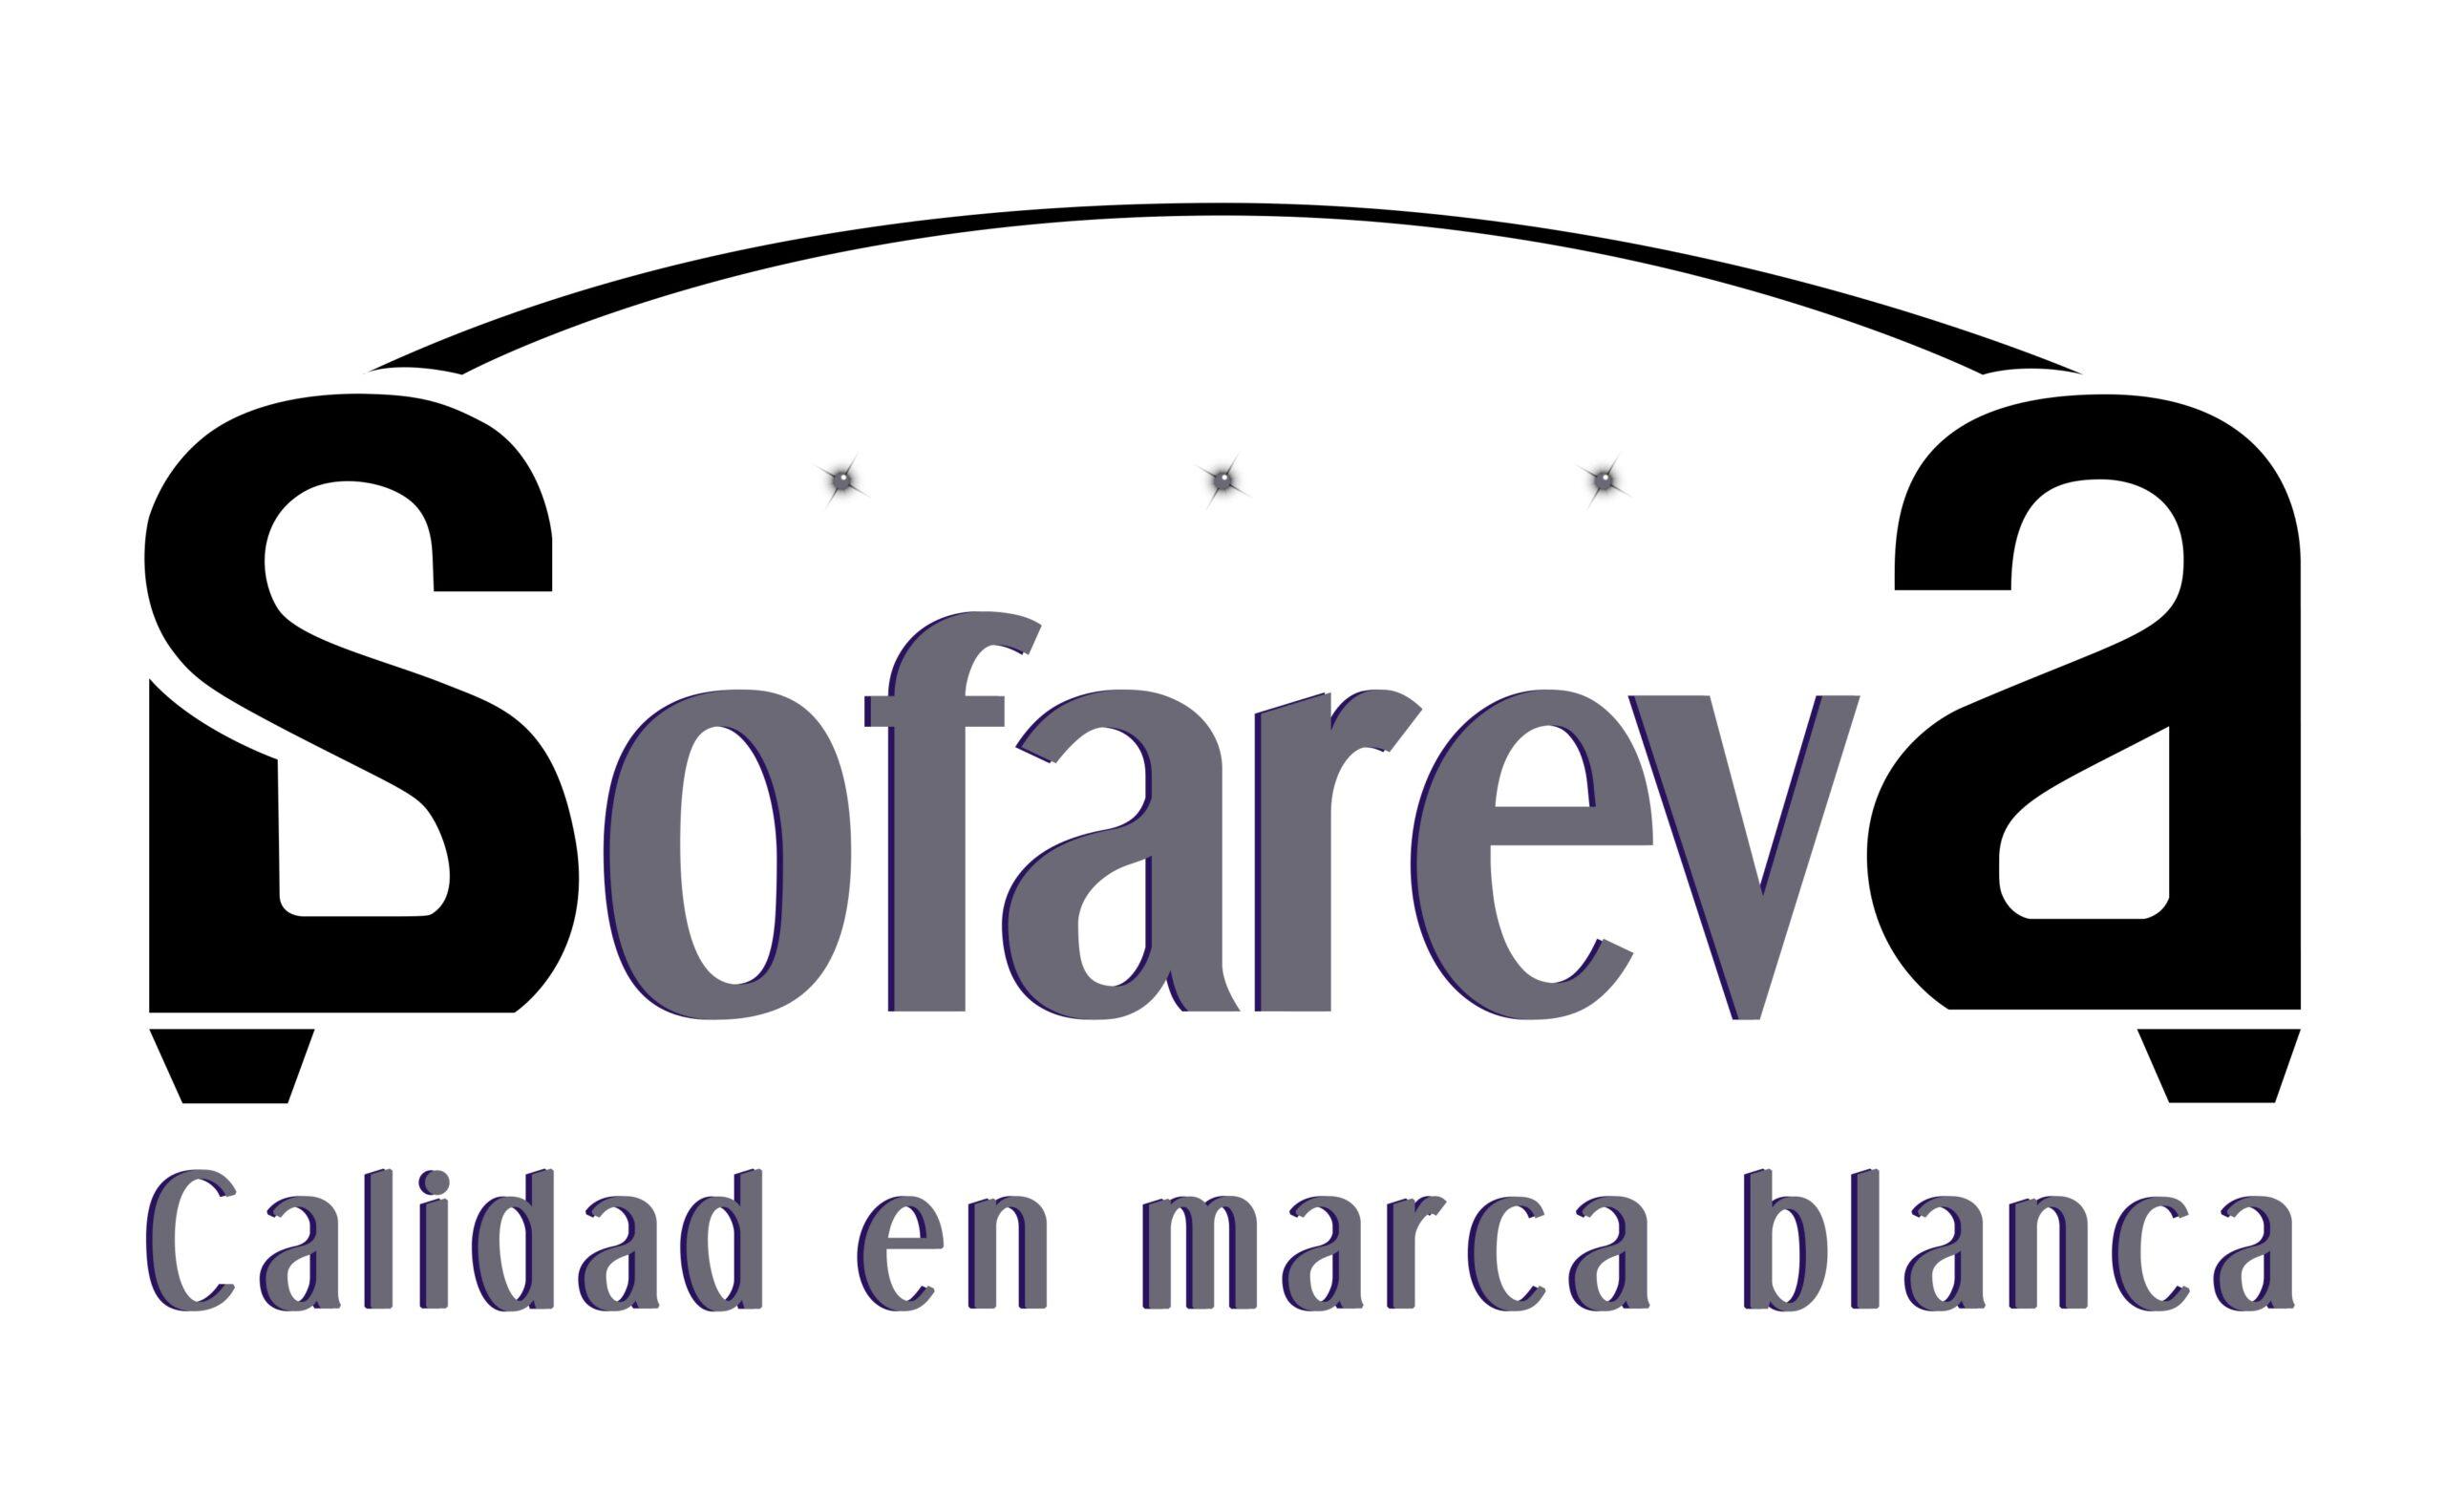 El Blog de Sofareva.es